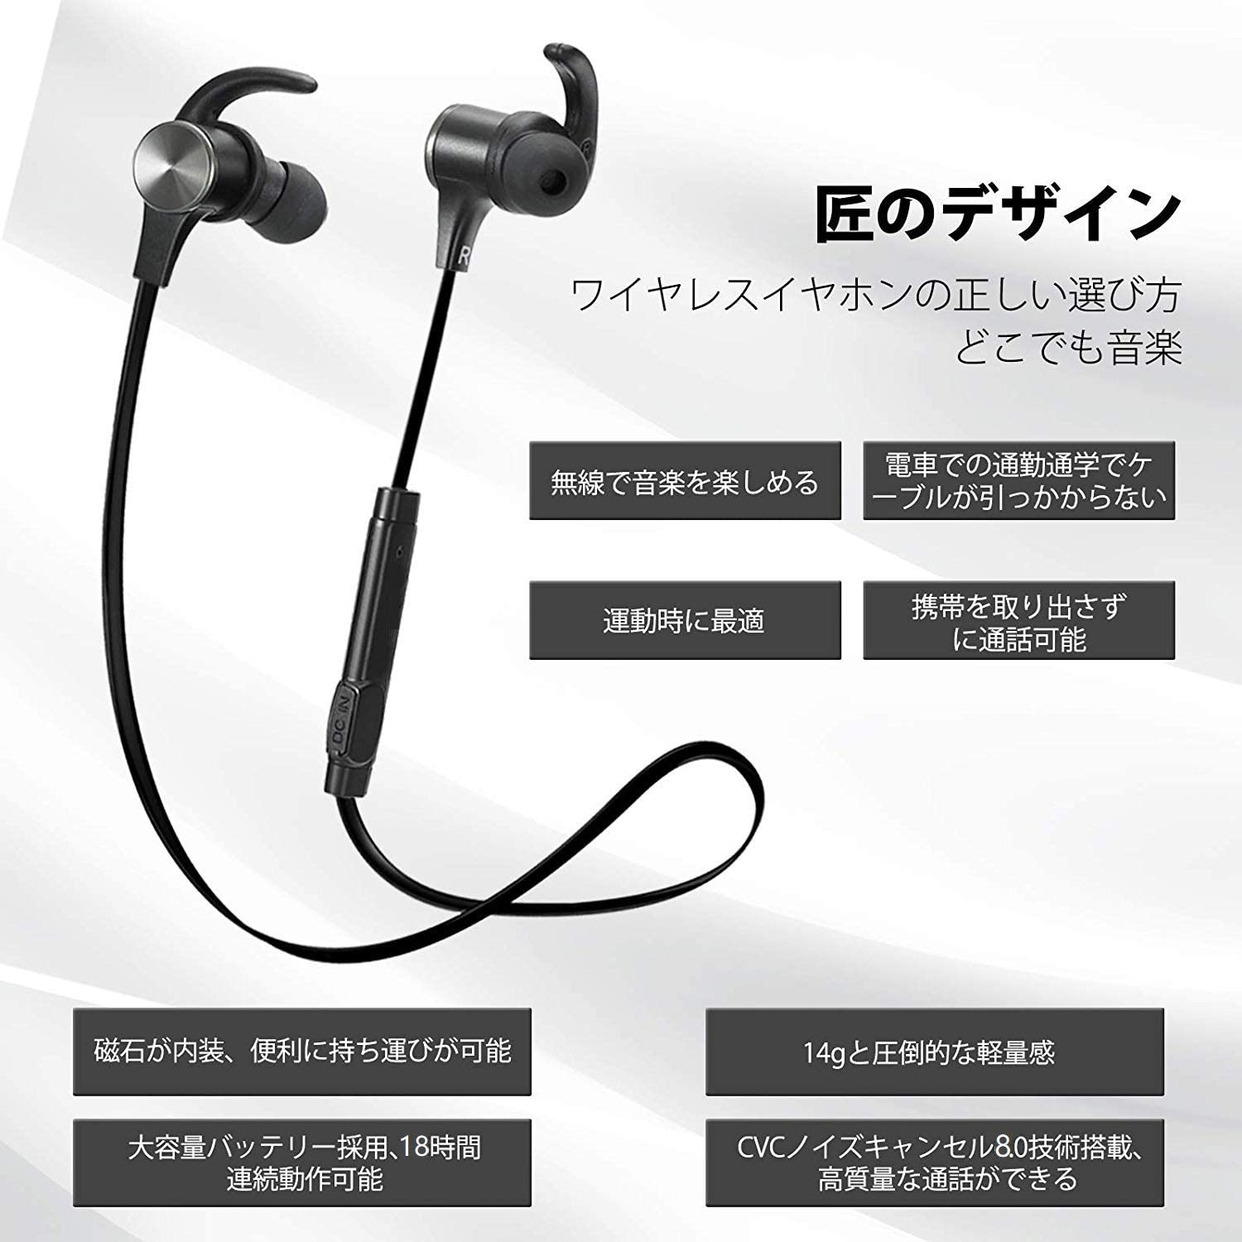 SUNVALLEY(サンバリー) boost TT-BH07の商品画像7